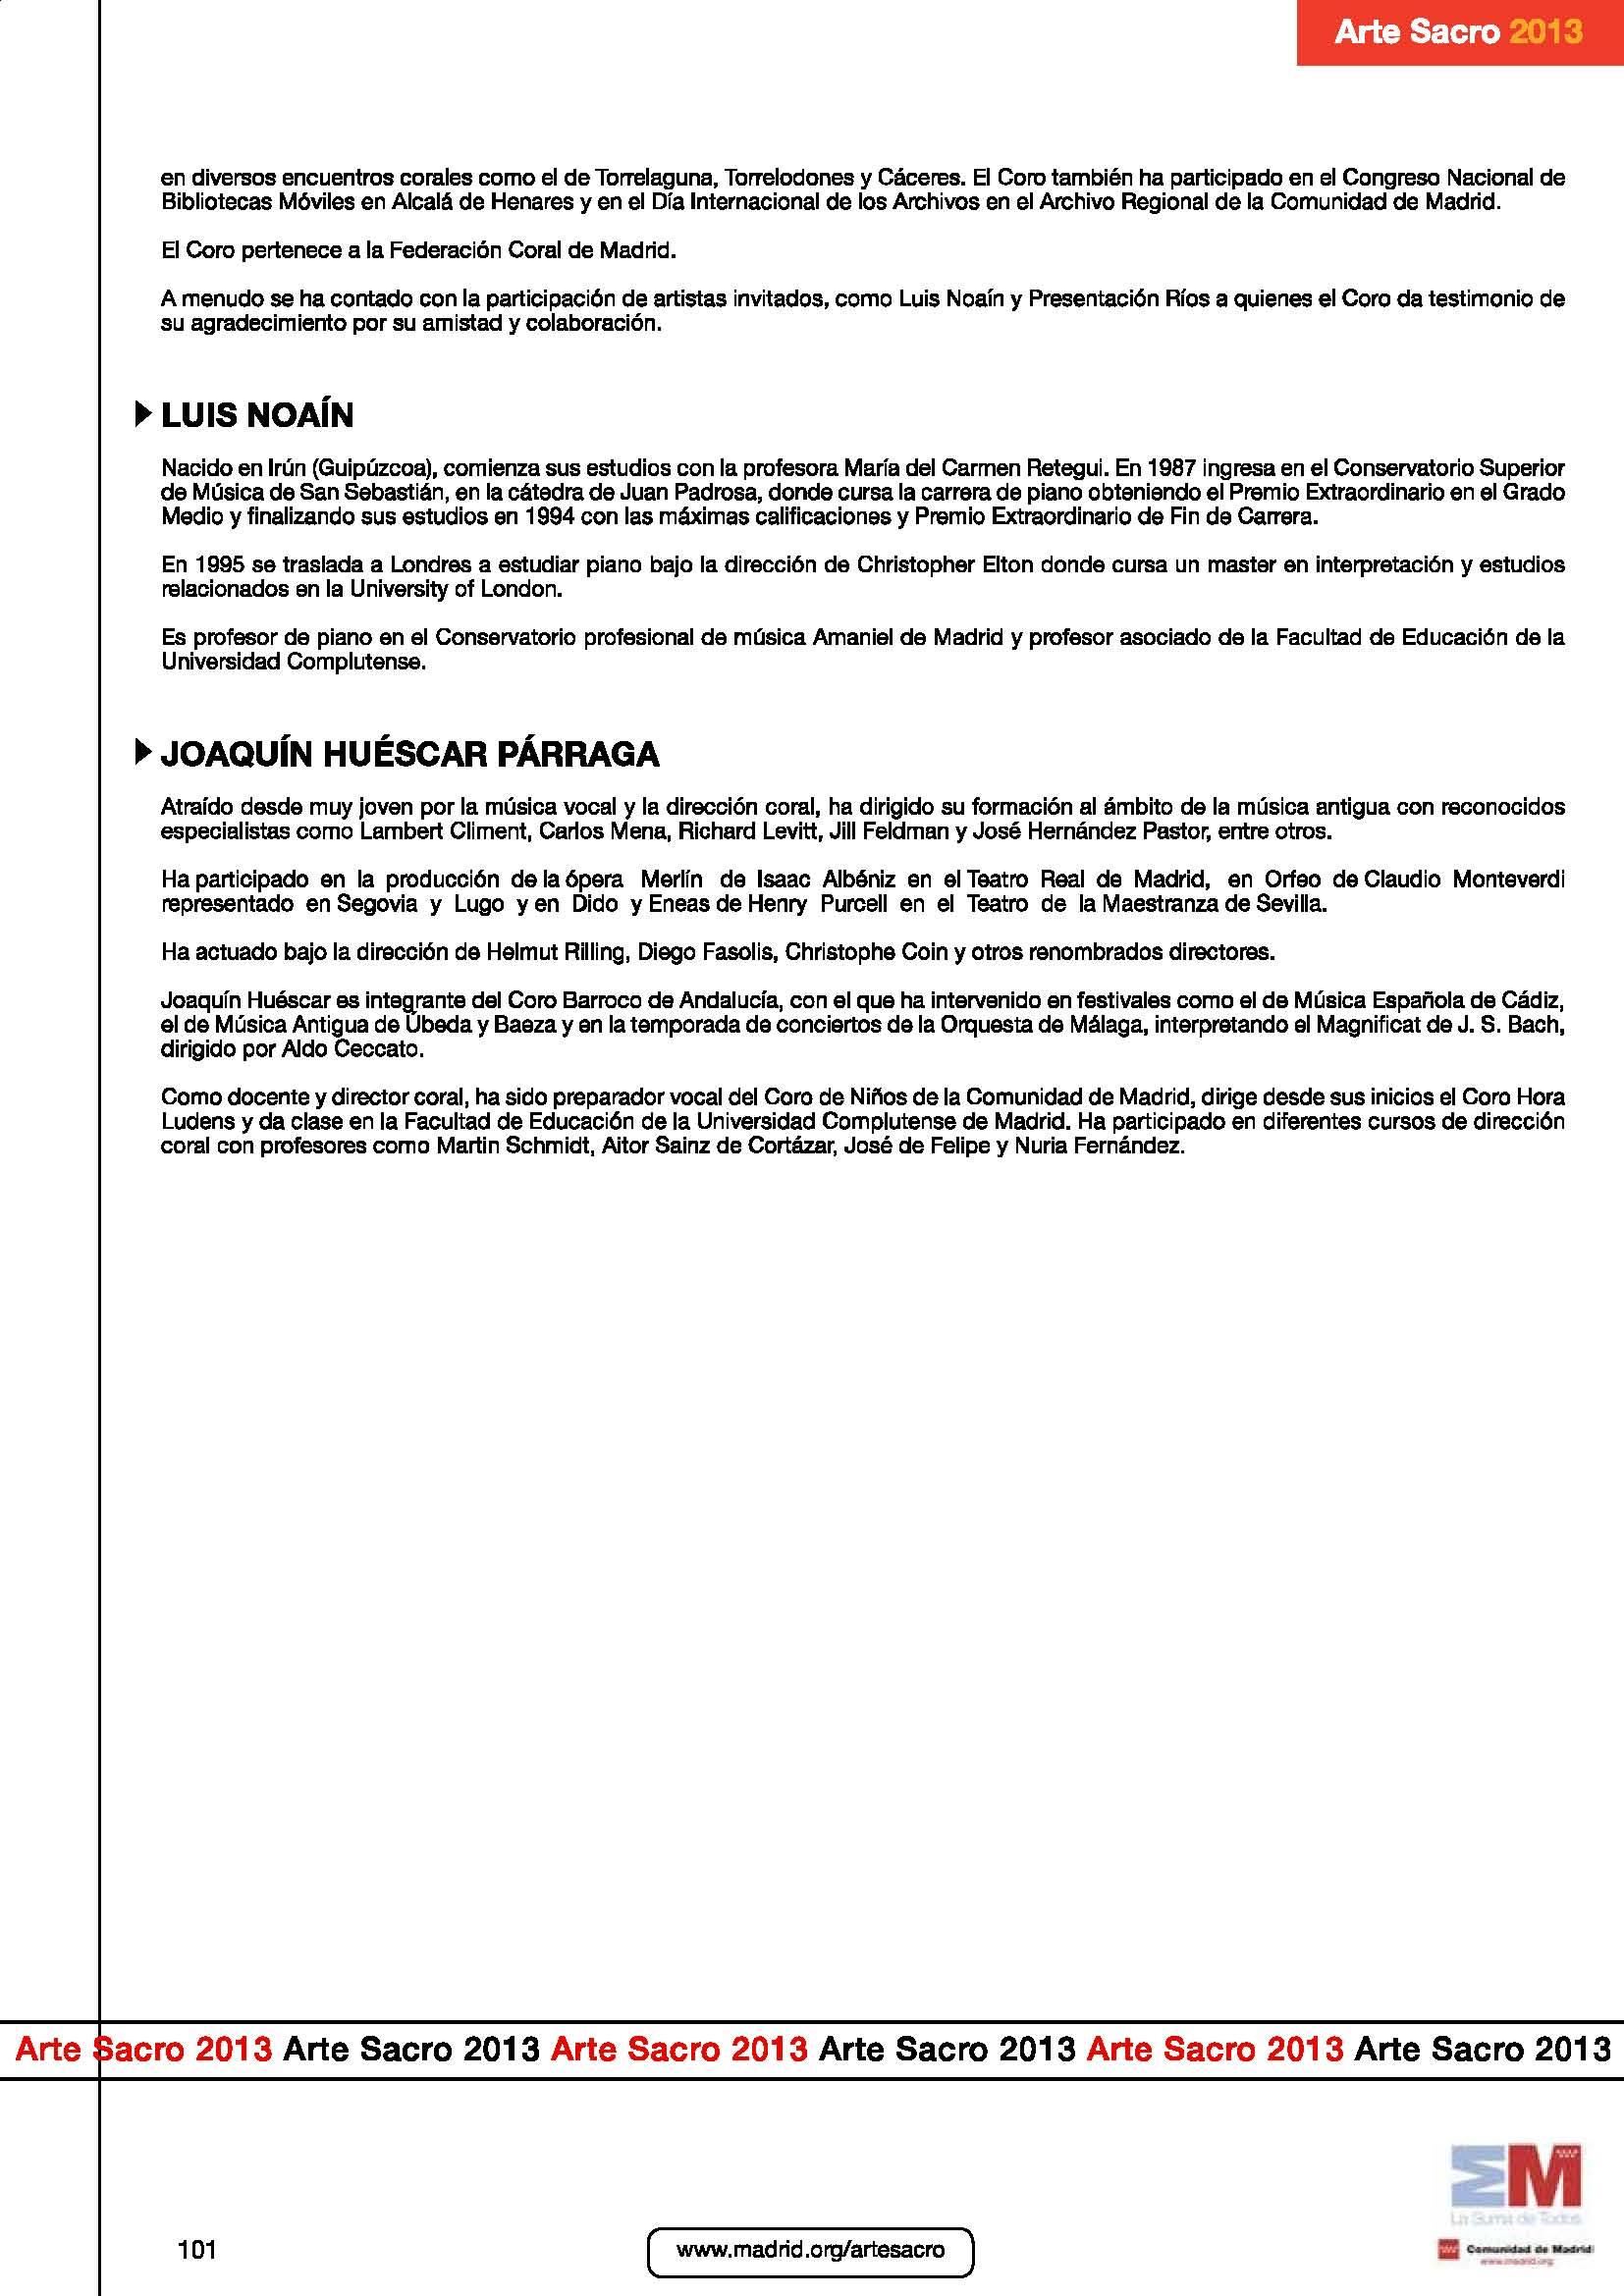 dossier_completo_Página_101